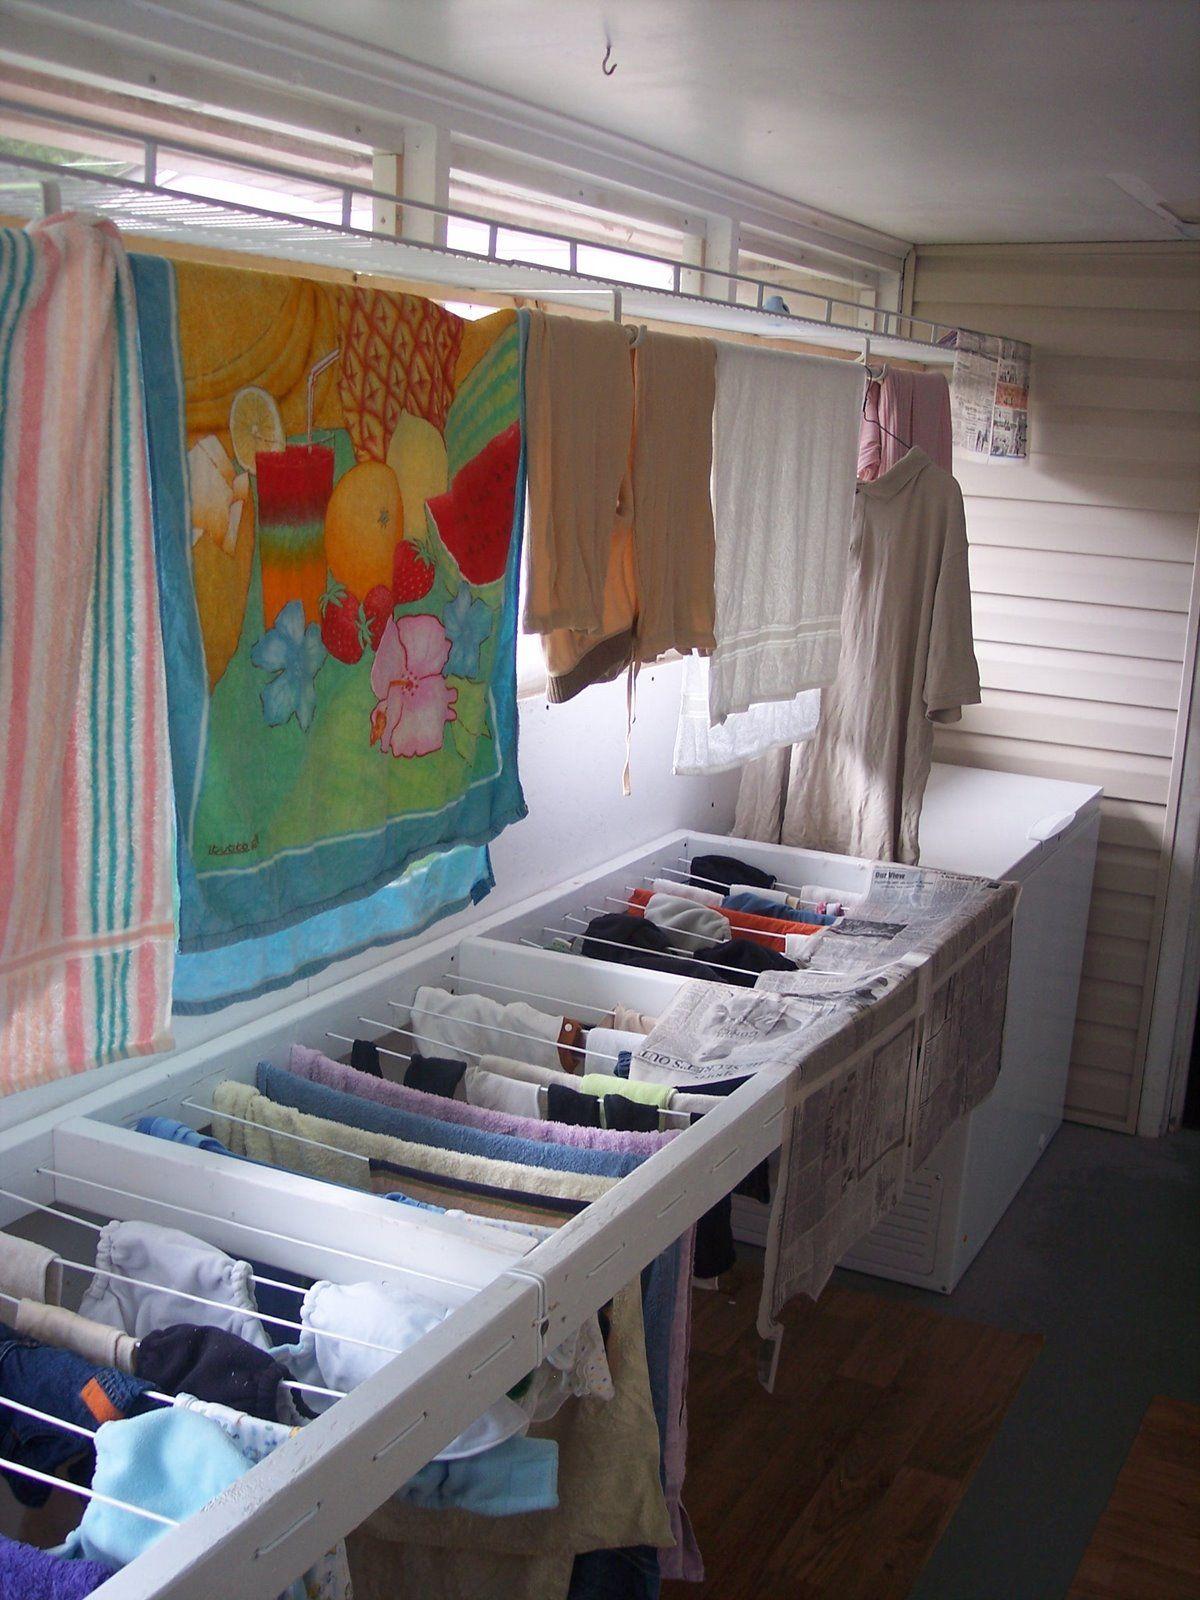 Jpg laundry pinterest cabinet organizers laundry